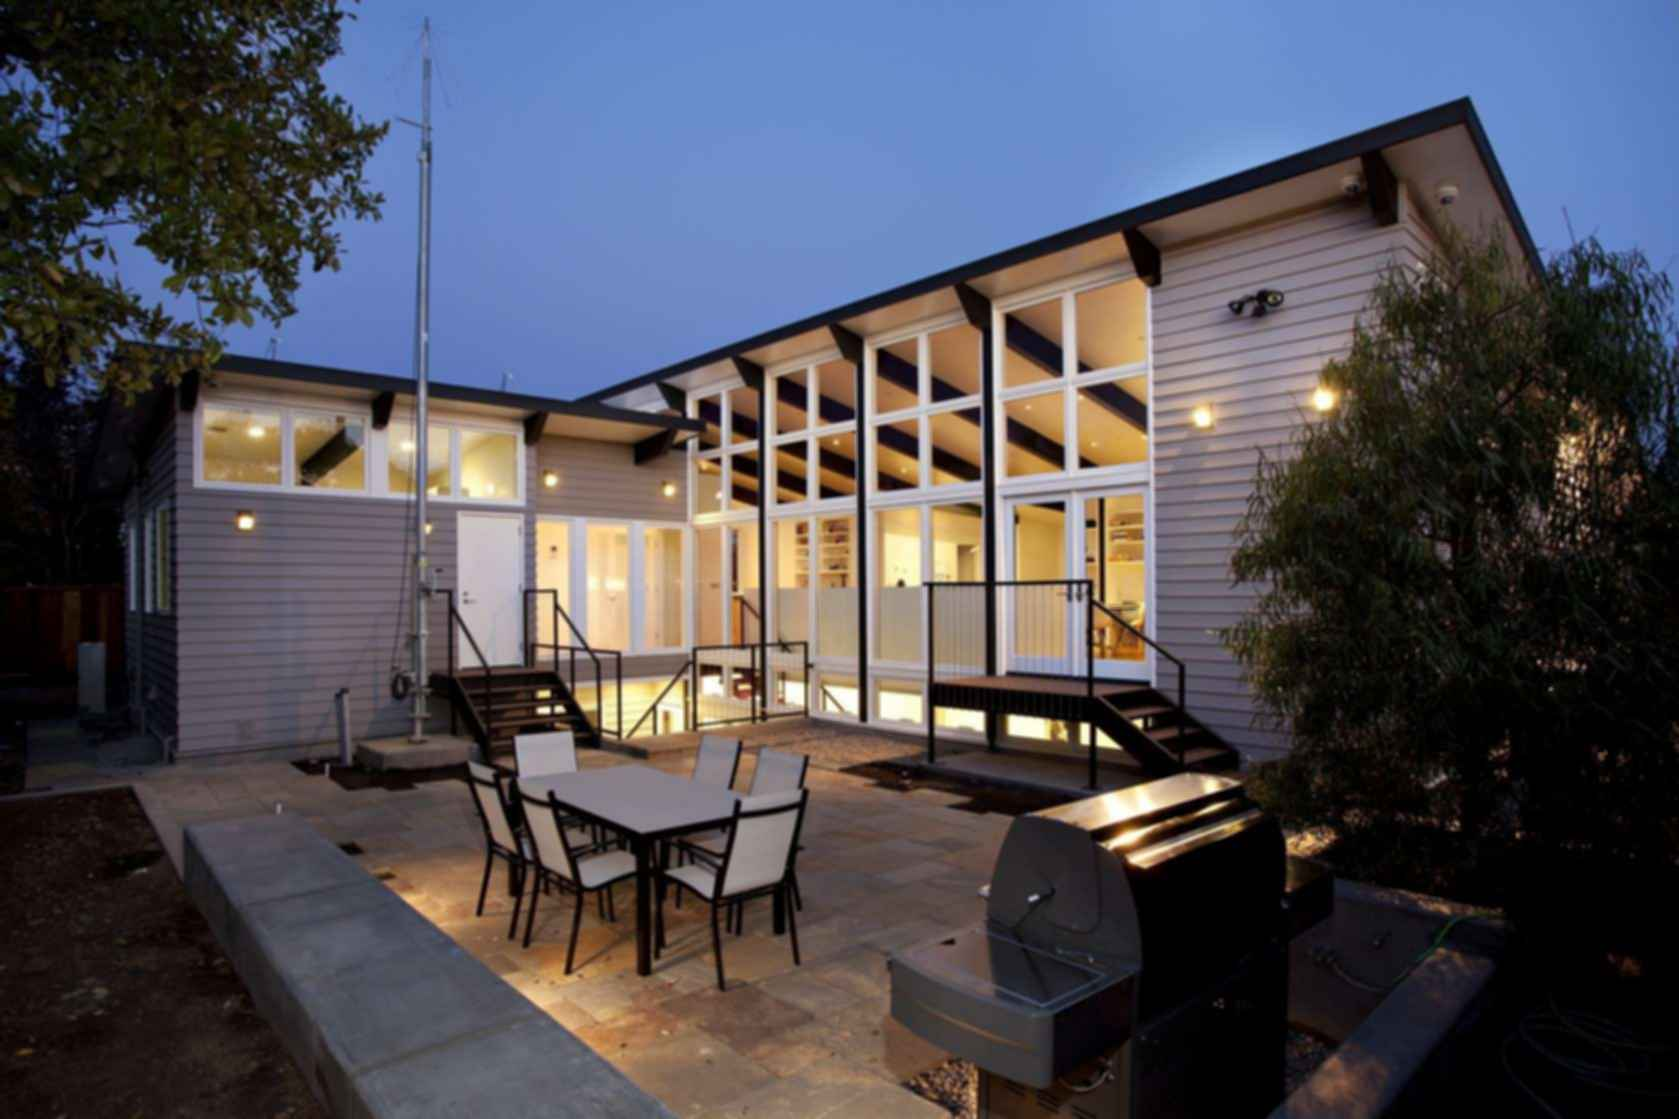 Net Zero Energy House - Exterior/Outdoor Area